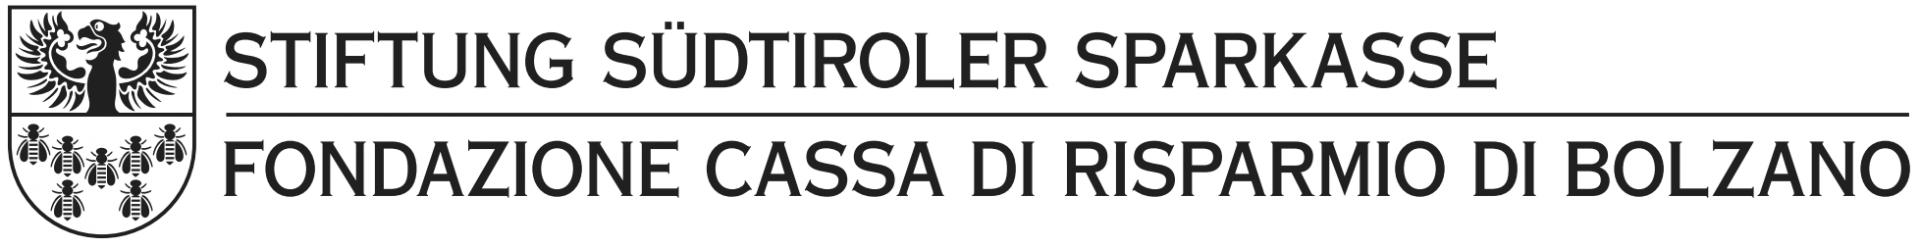 Fondazione Sparkasse